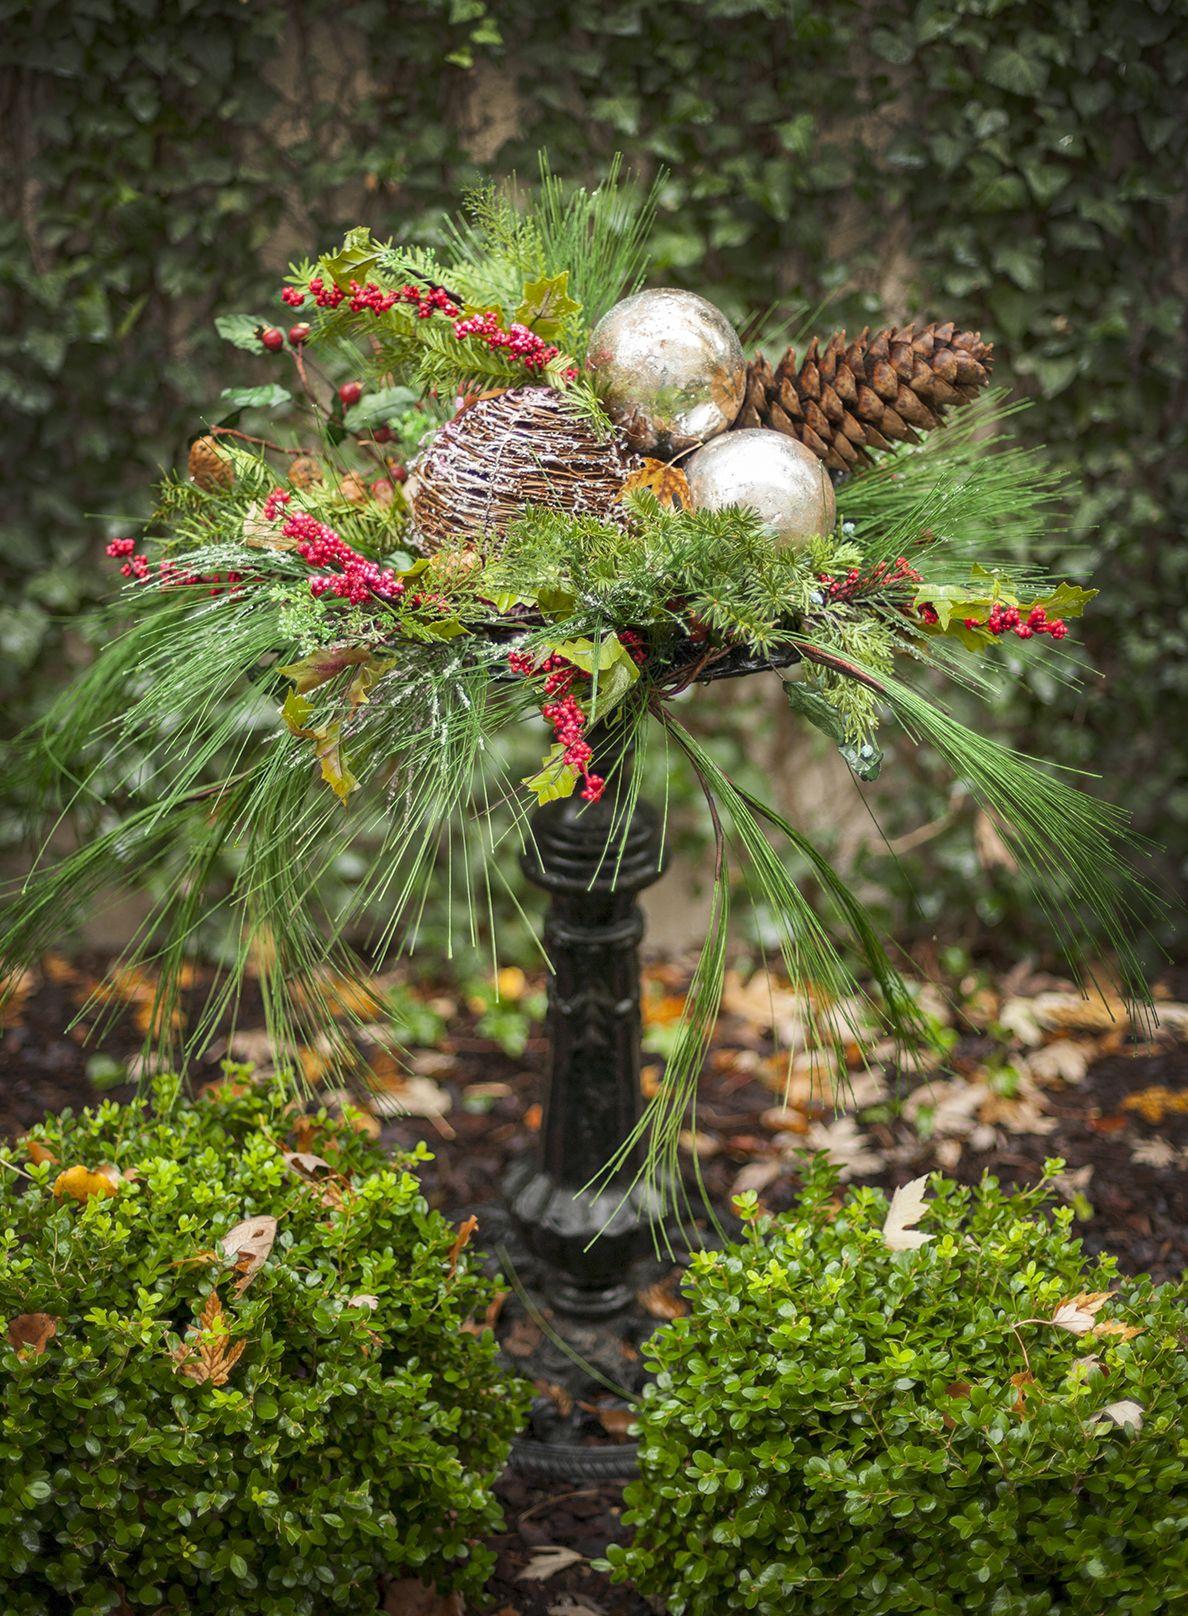 HOL-8349 Winter Birdbath by Nell Hill. I love the idea of decorating ...